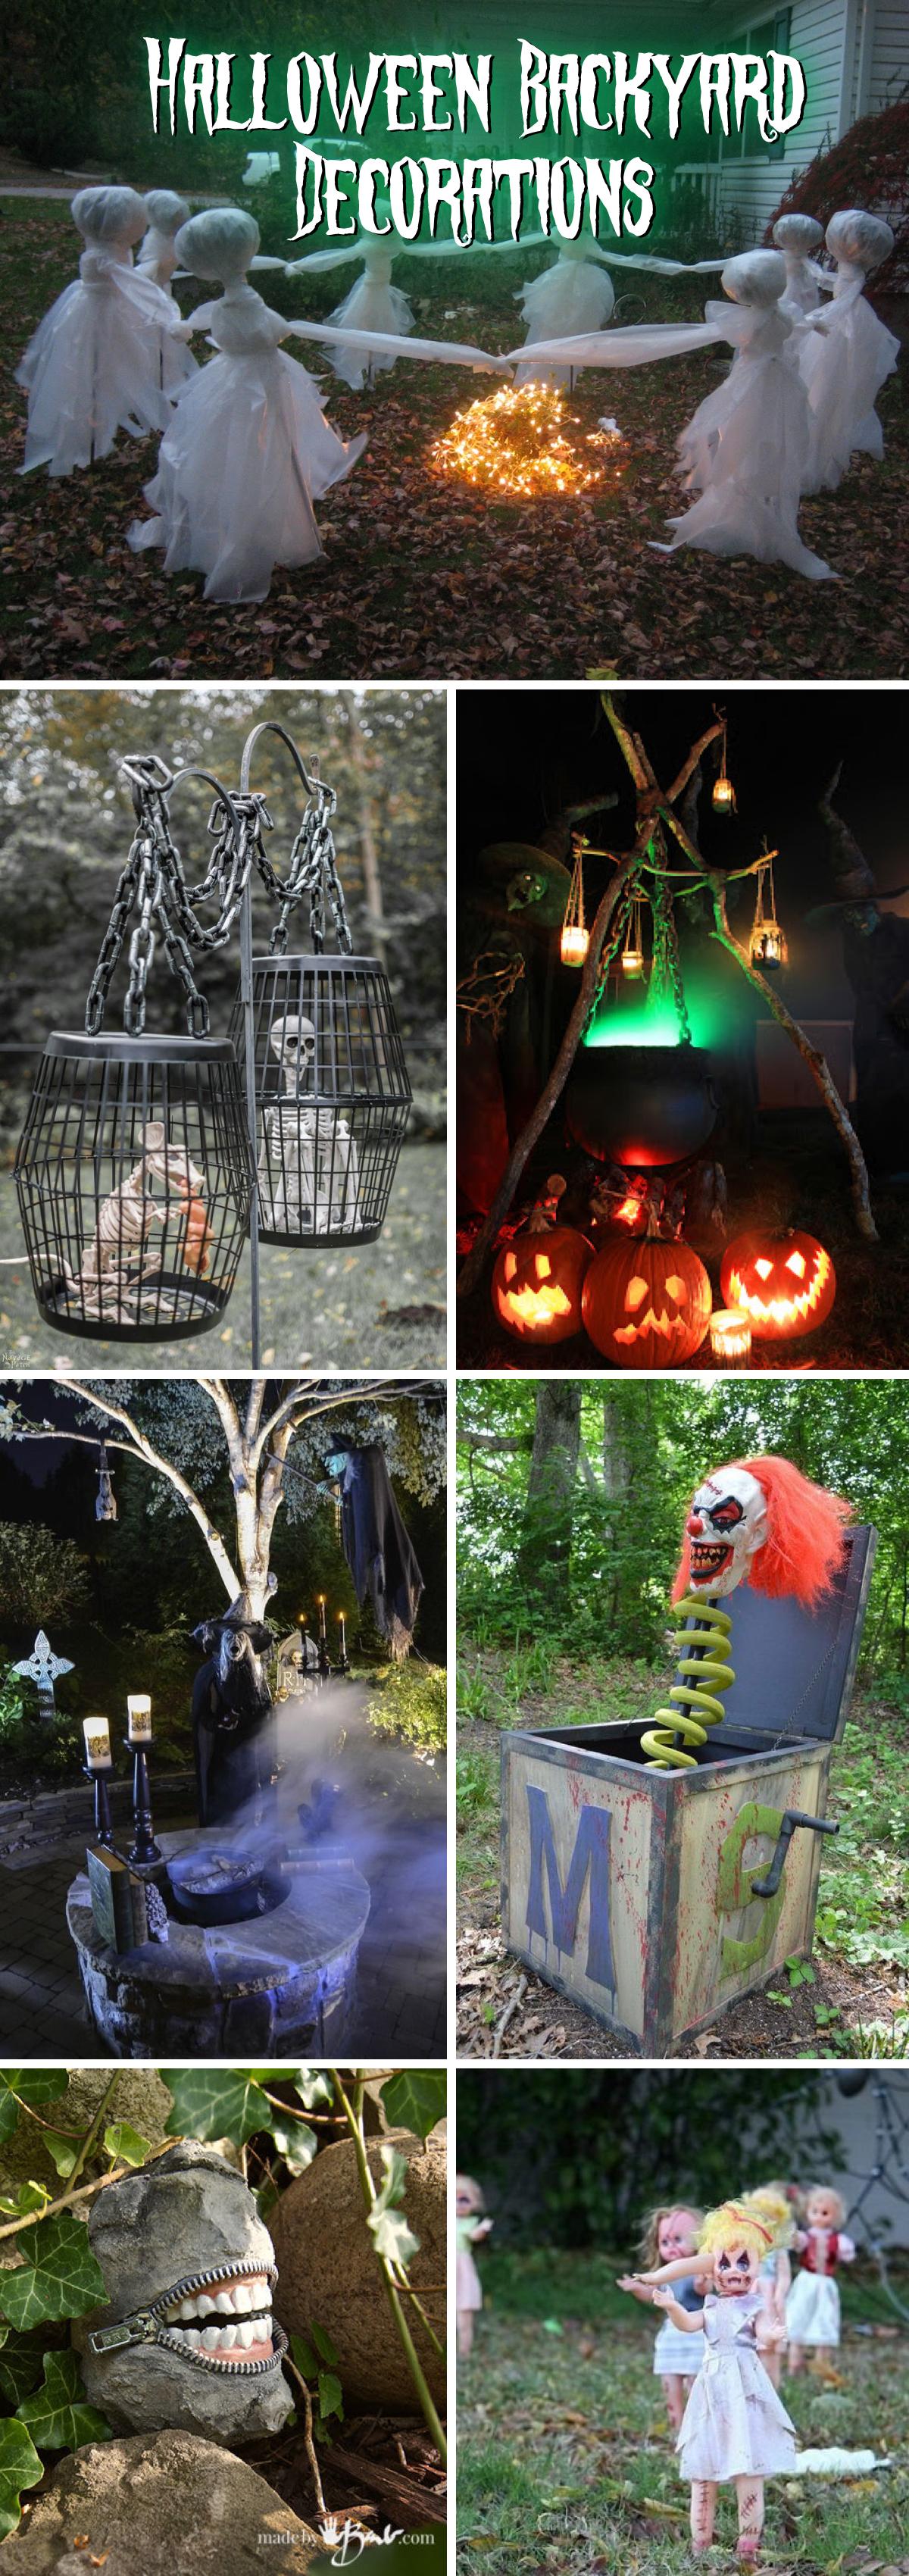 Halloween Backyard Decorations